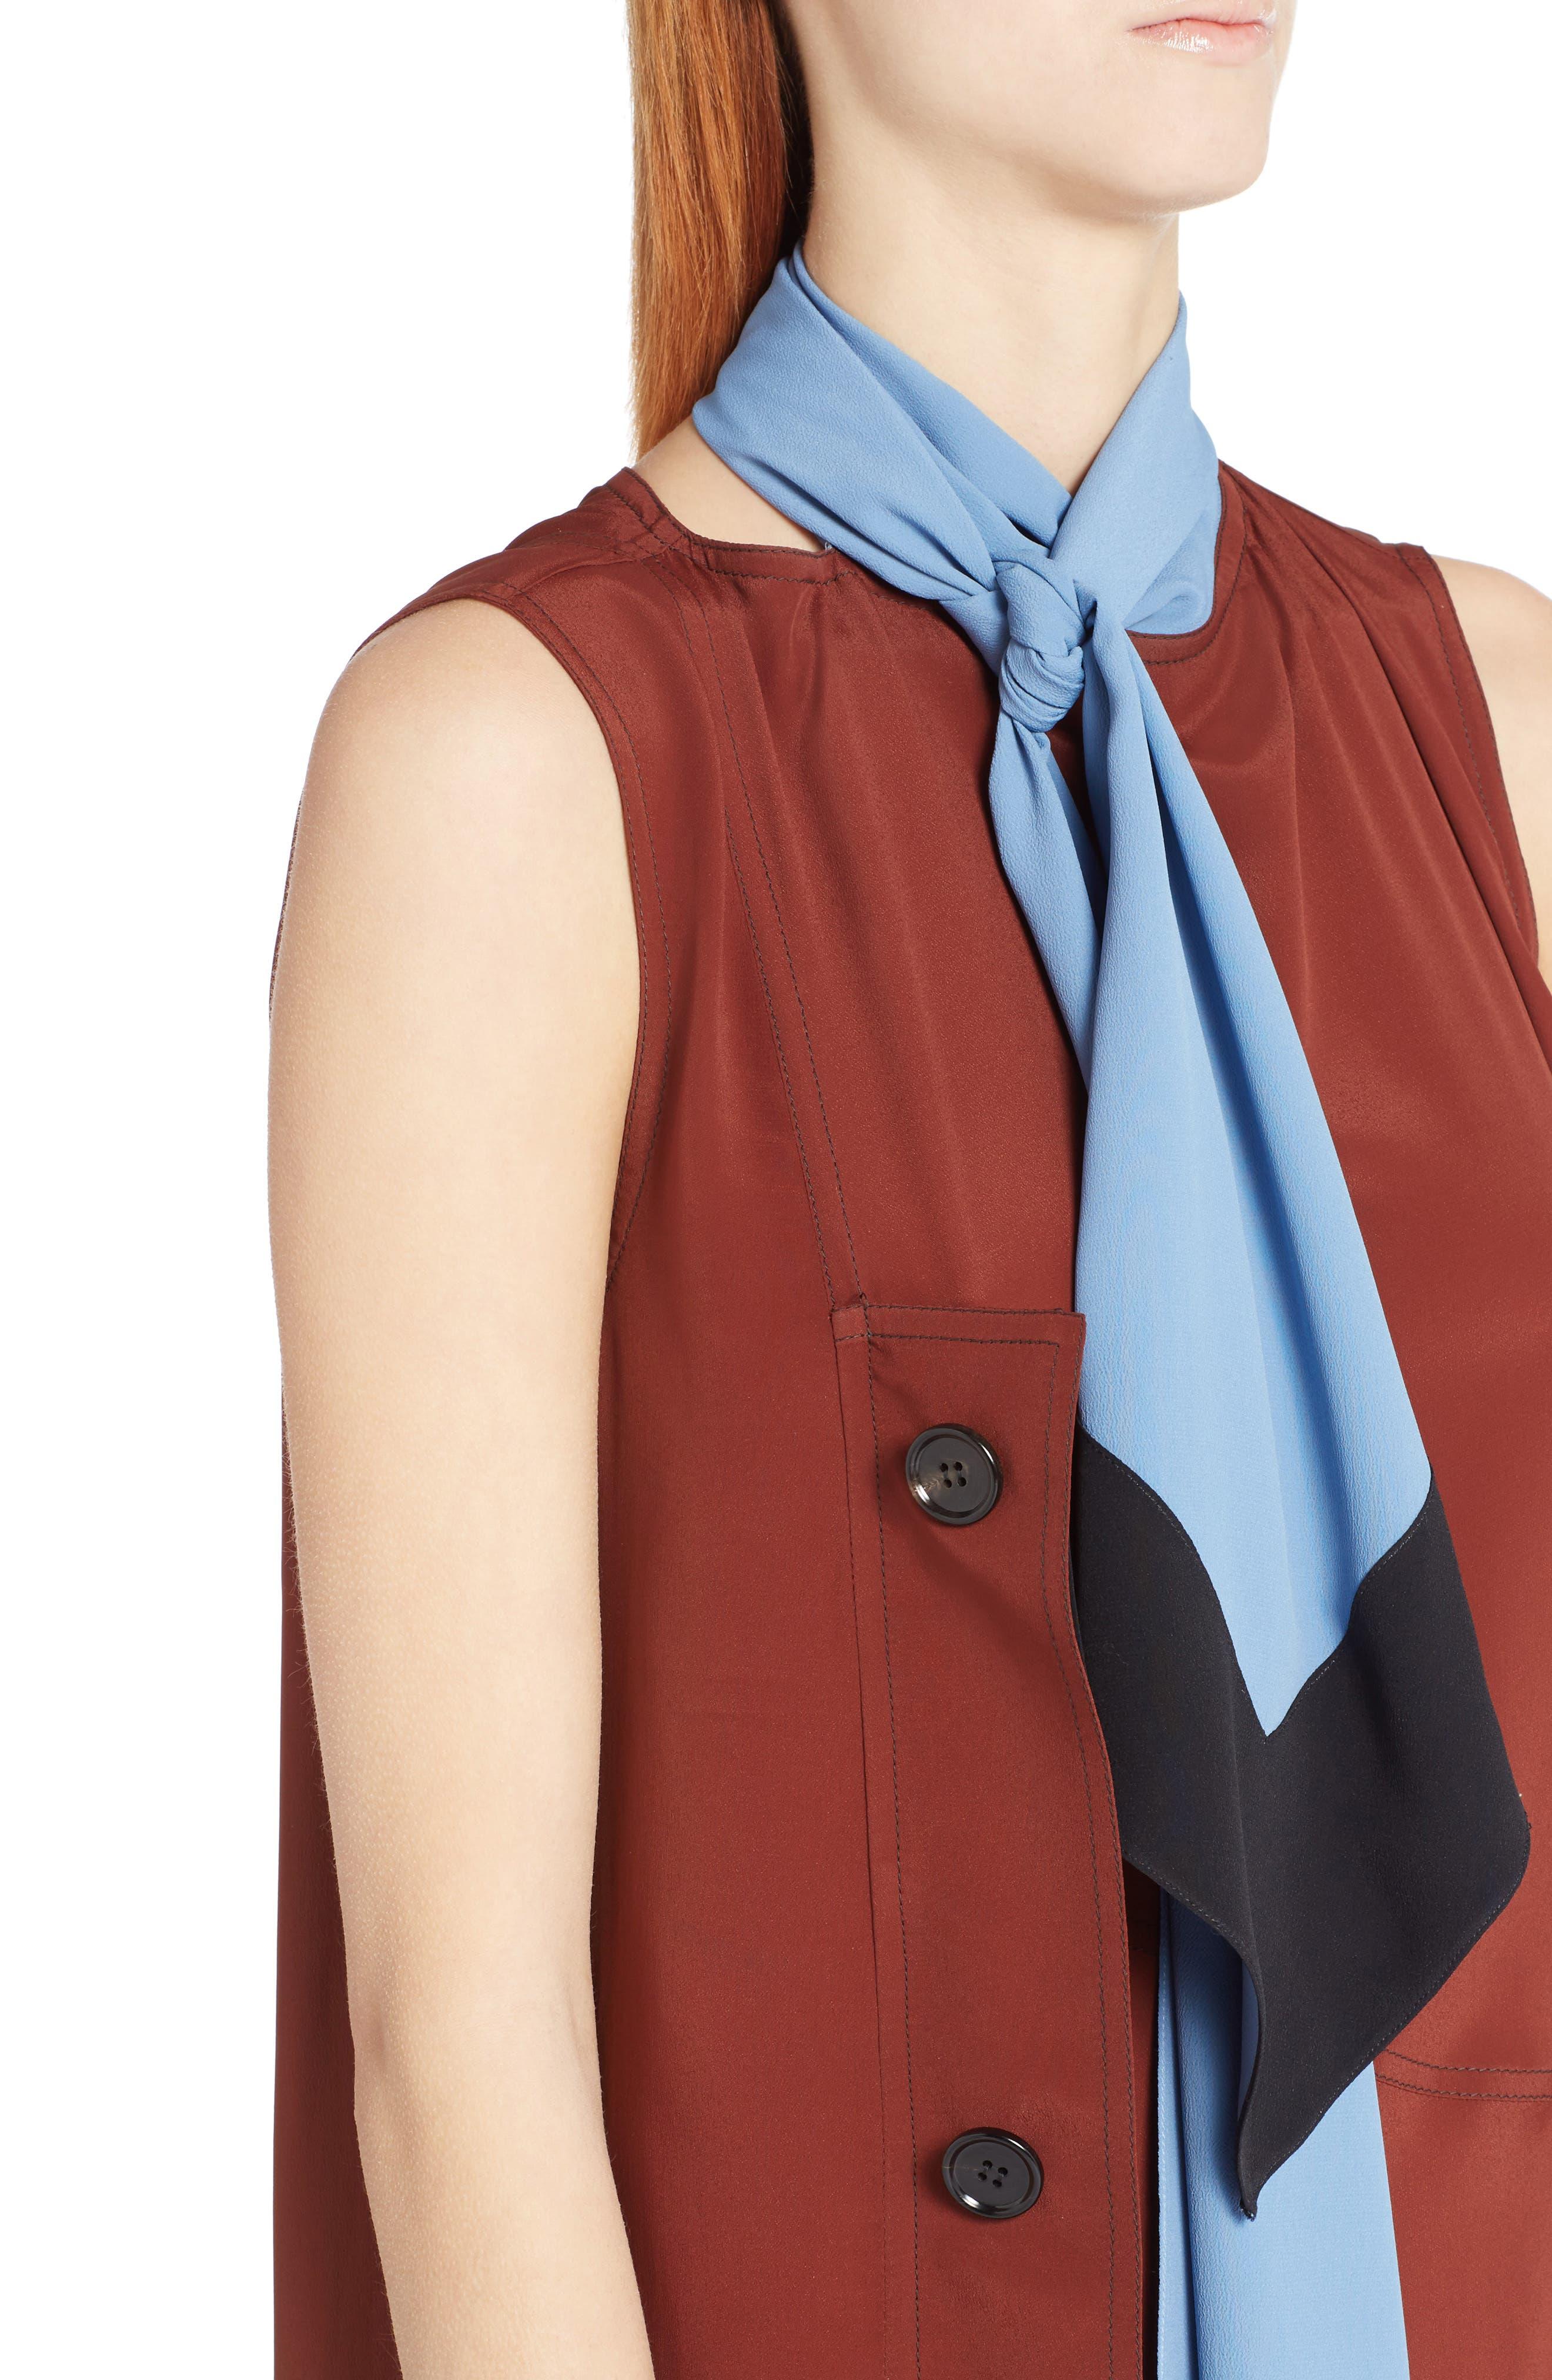 Tie Neck Side Button Dress,                             Alternate thumbnail 5, color,                             Port Red